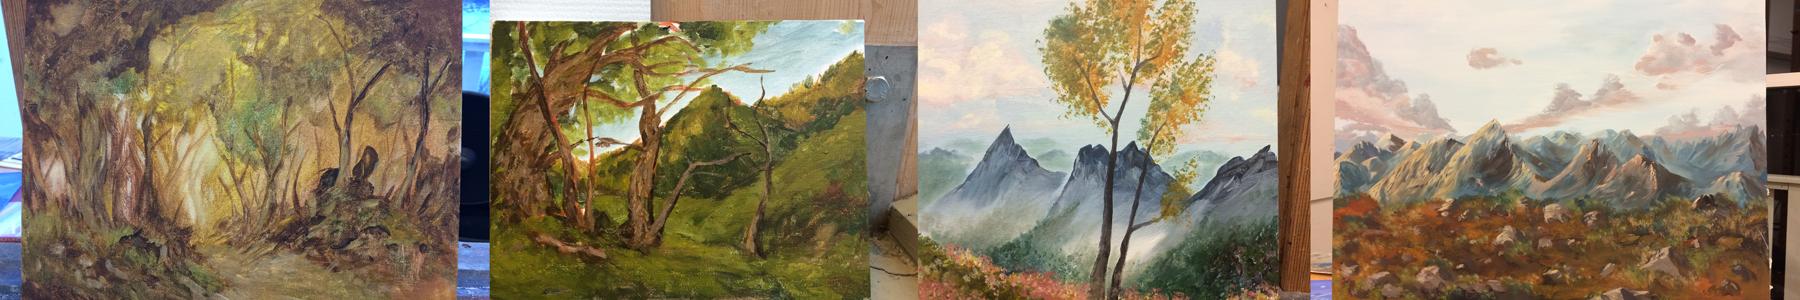 Landscape compilation by GTT-ART